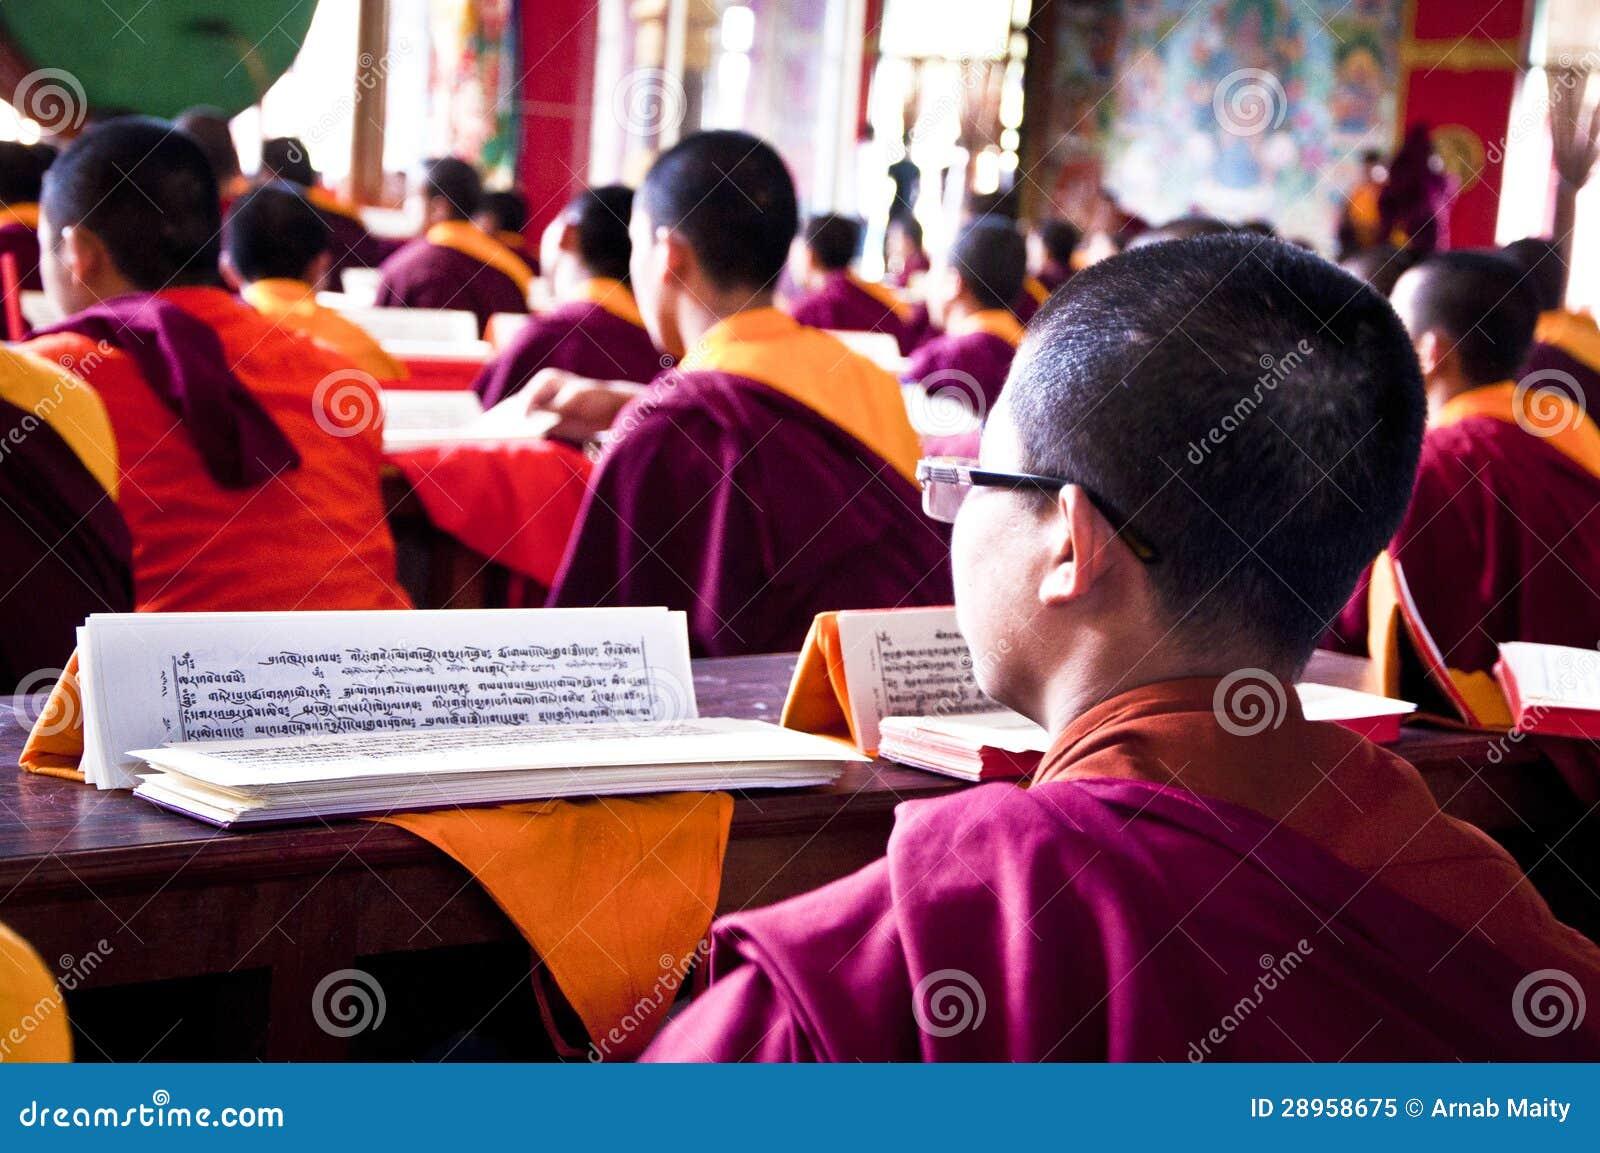 buddhist singles in tiff The film will screen on thursday, july 7th, 2016 at 7 pm at toronto's tiff bell lightbox cinema 4 (350 king st w, toronto on m5v 3x5) jeff beecher.